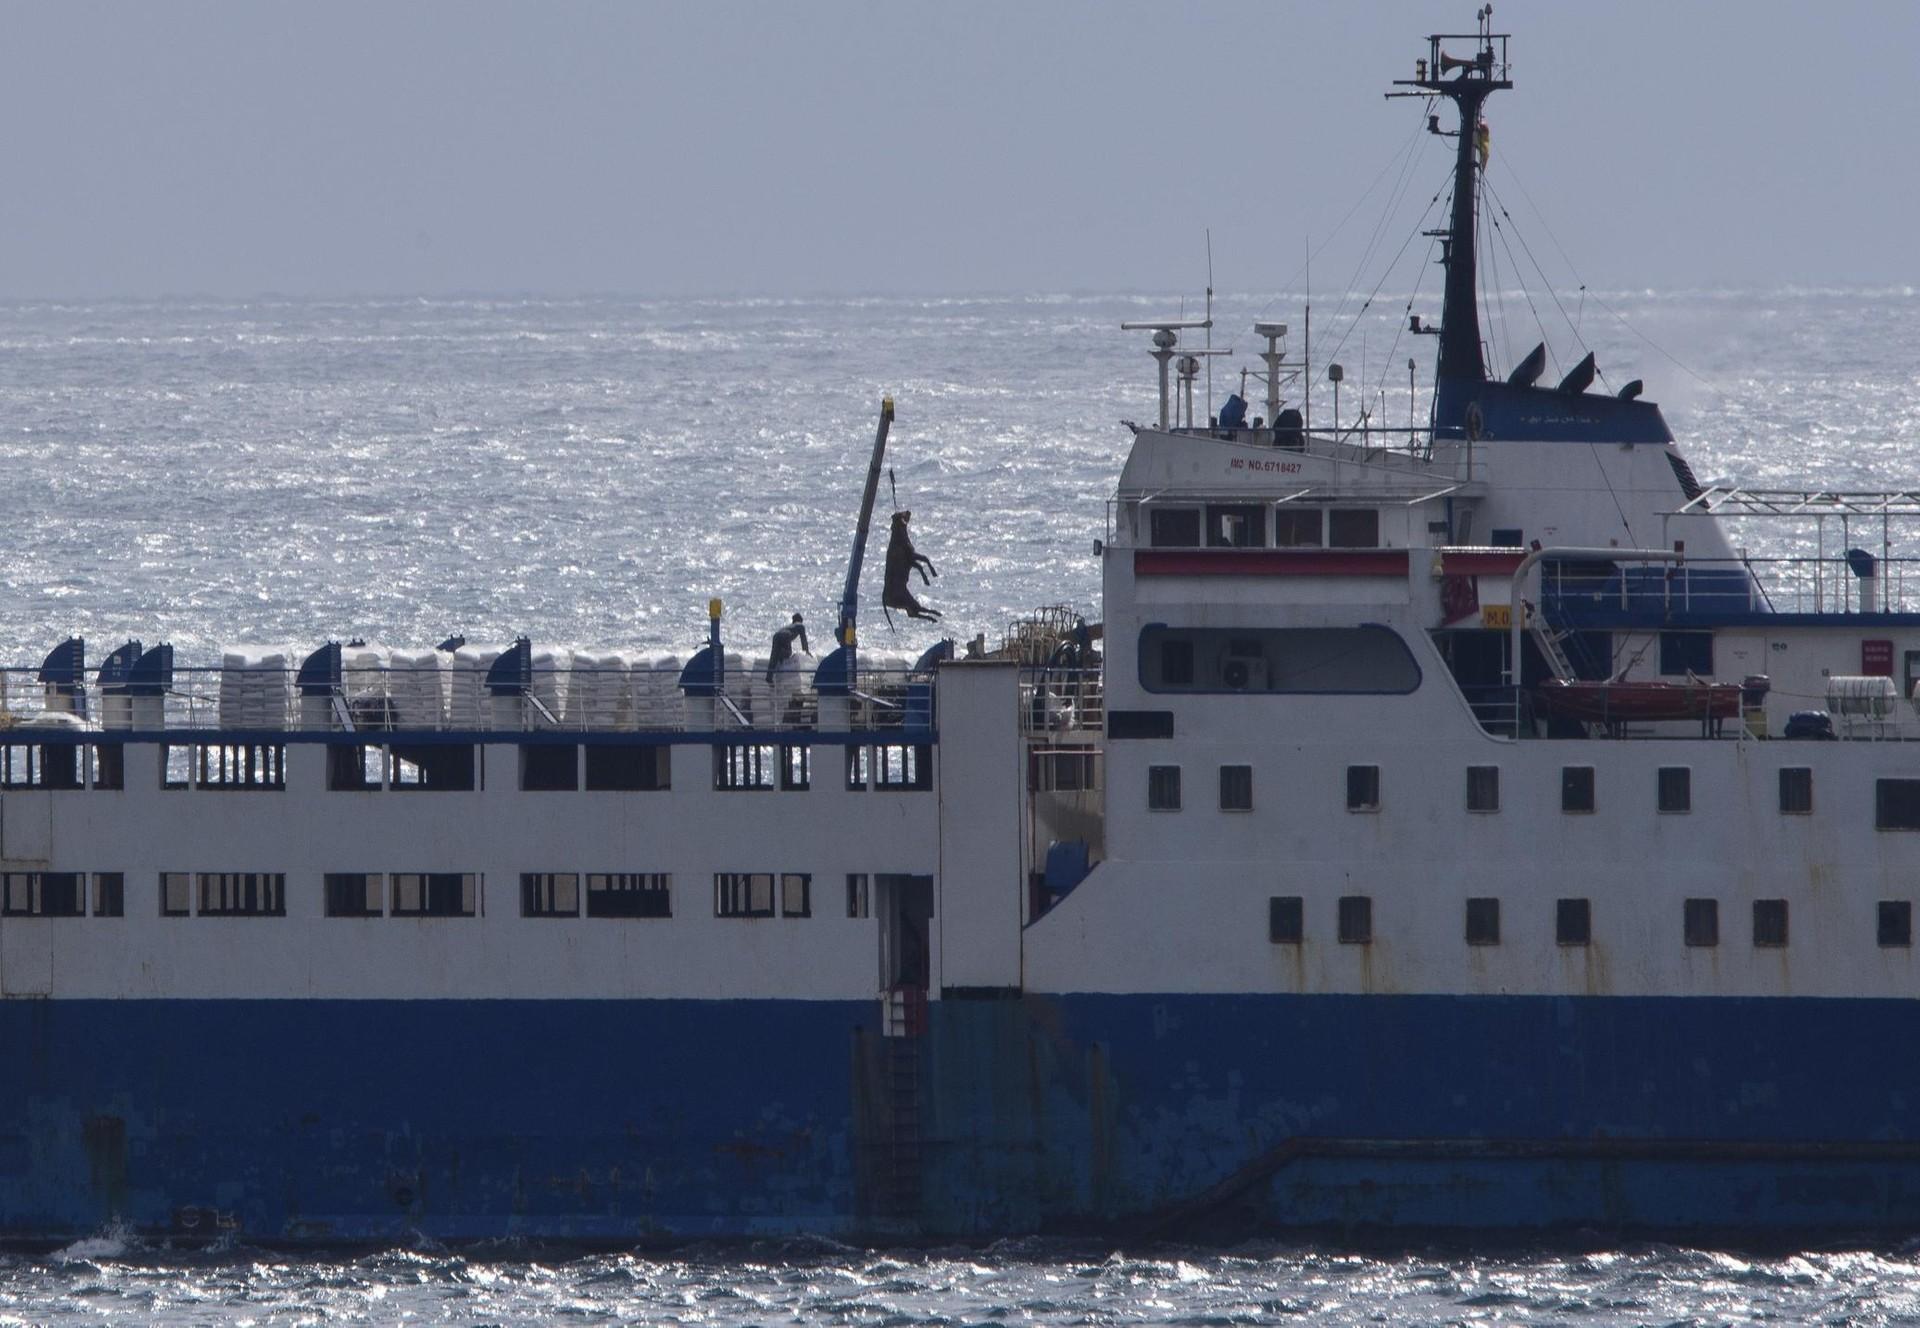 Tiertransport-Schiff in Cartagena